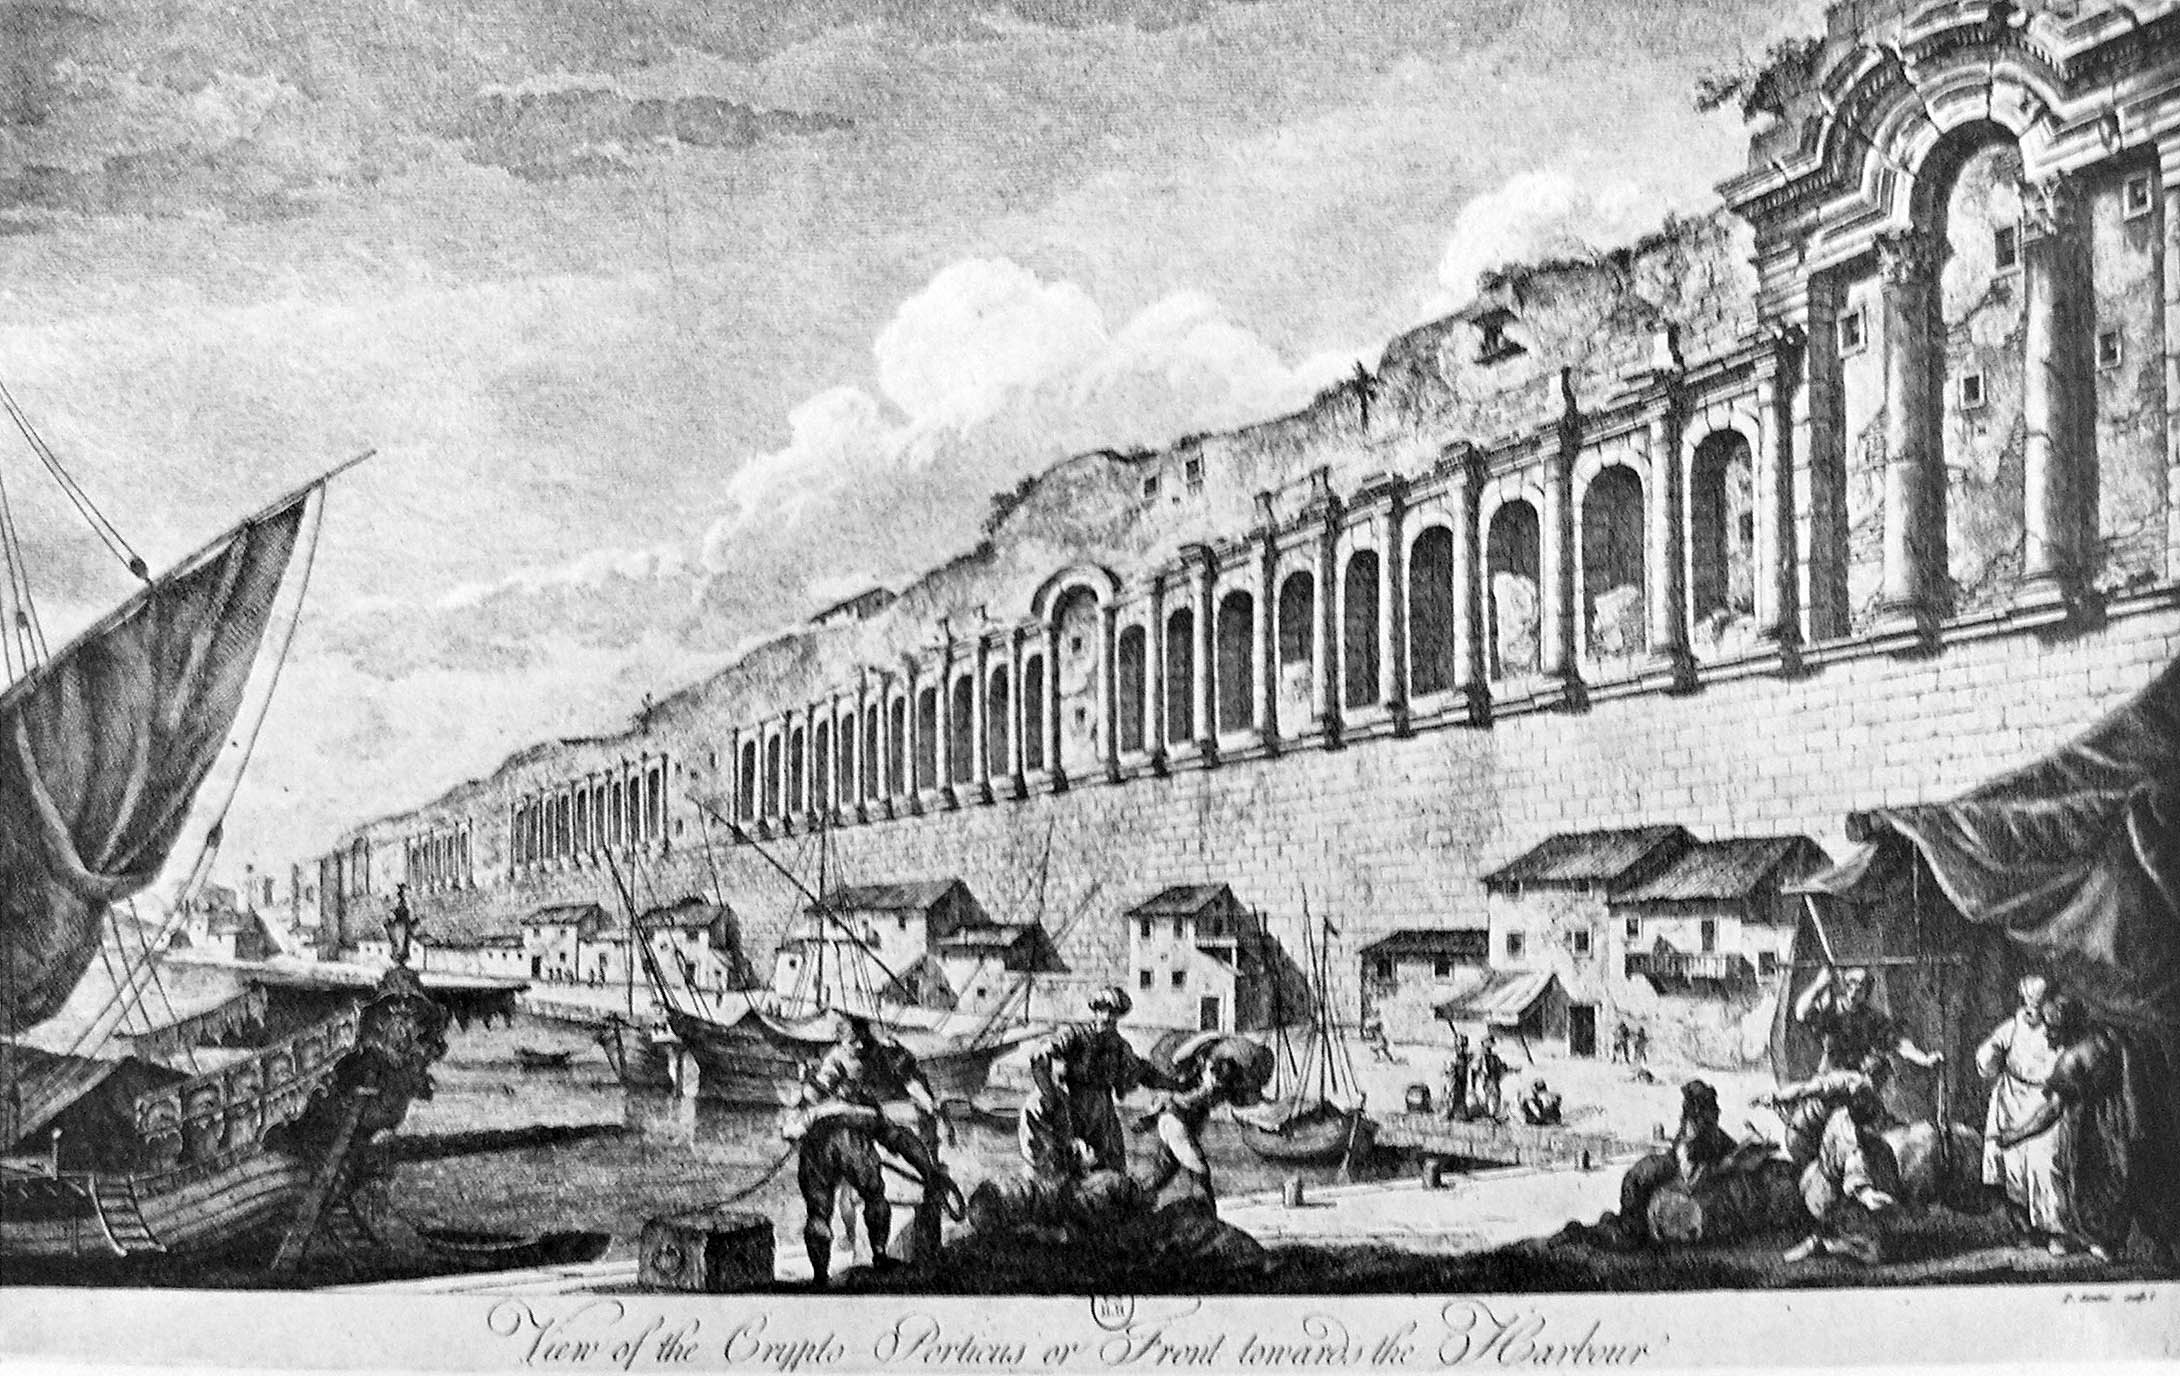 nengravingoftheseawardwallsofthecityofplit,roatiaplitbyobertdam,1764.hewallswereoriginallybuiltfortheomaniocletiansalace.